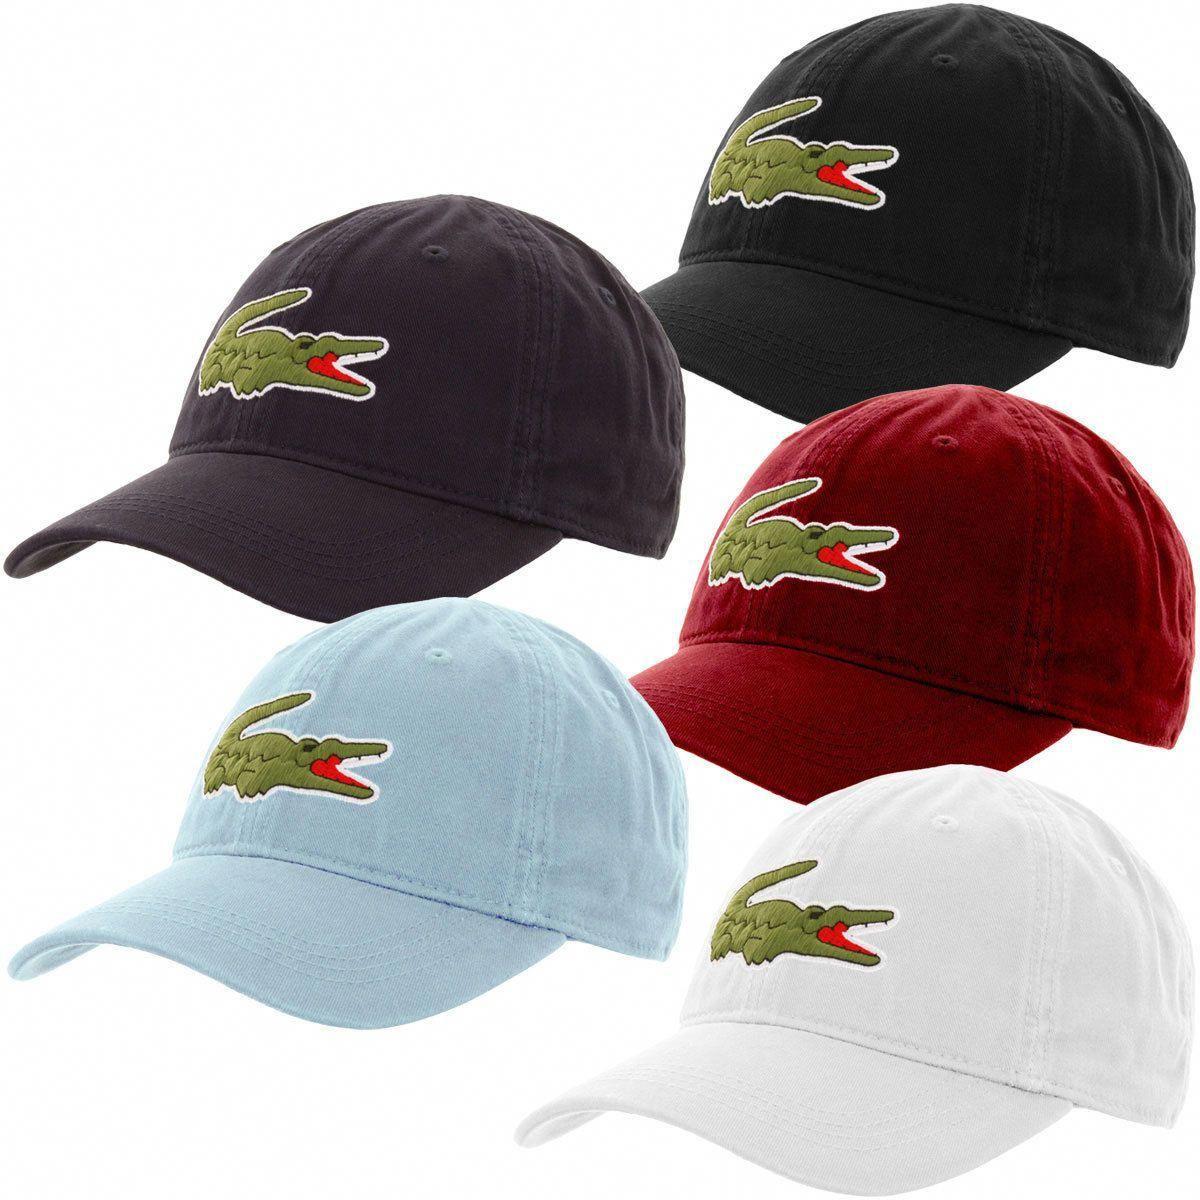 eda637da3d3b13 Lacoste Men's Big Croc Gabardine Cap Dadhats - One Size Hat Rk8217-51  #LandscapingIdeasAndTips